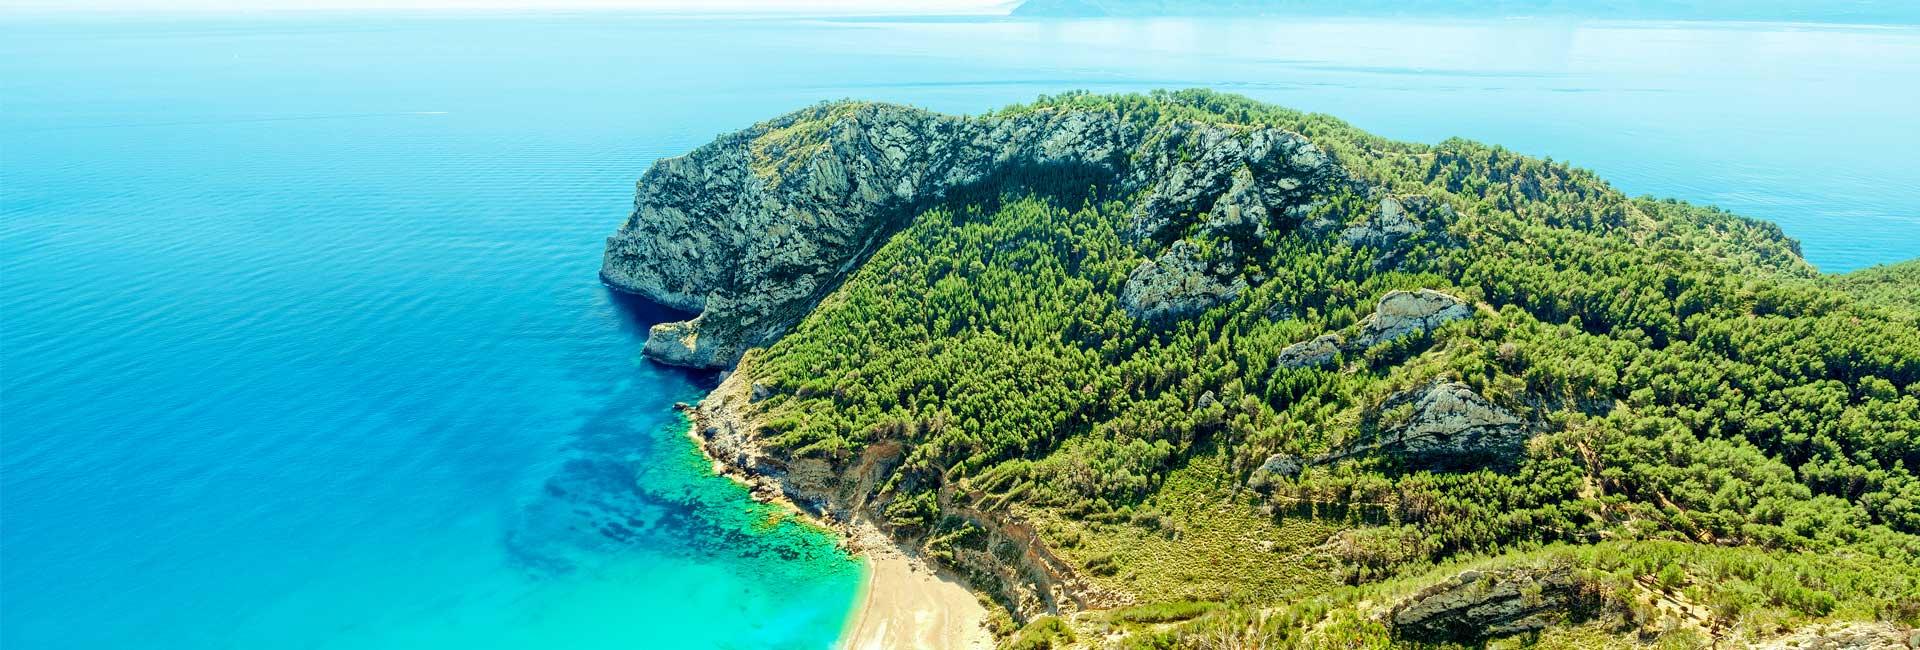 Spanisch Intensivkurse in Mallorca